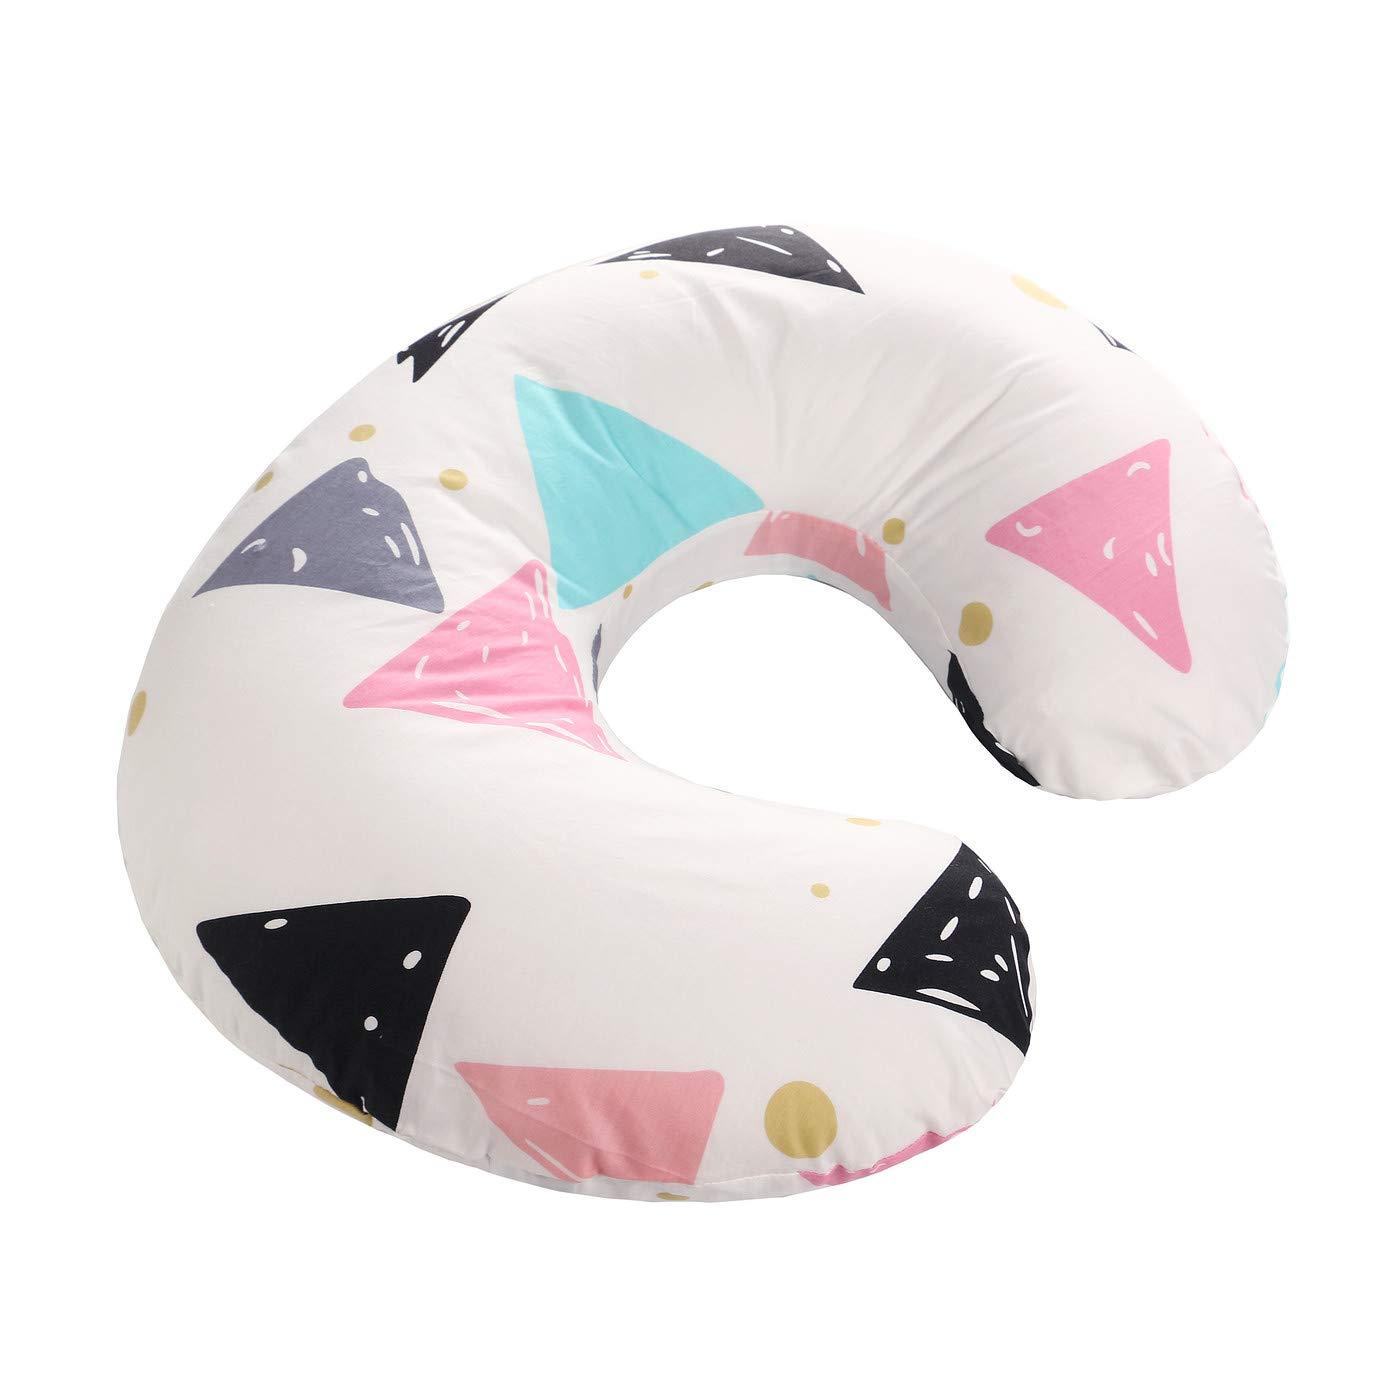 VERNASSA Nursing Pillow, Breastfeeding Baby Support Pillow| Newborn Infant Feeding Cushion | Portable for Travel (Colorful Triangle) by VERNASSA